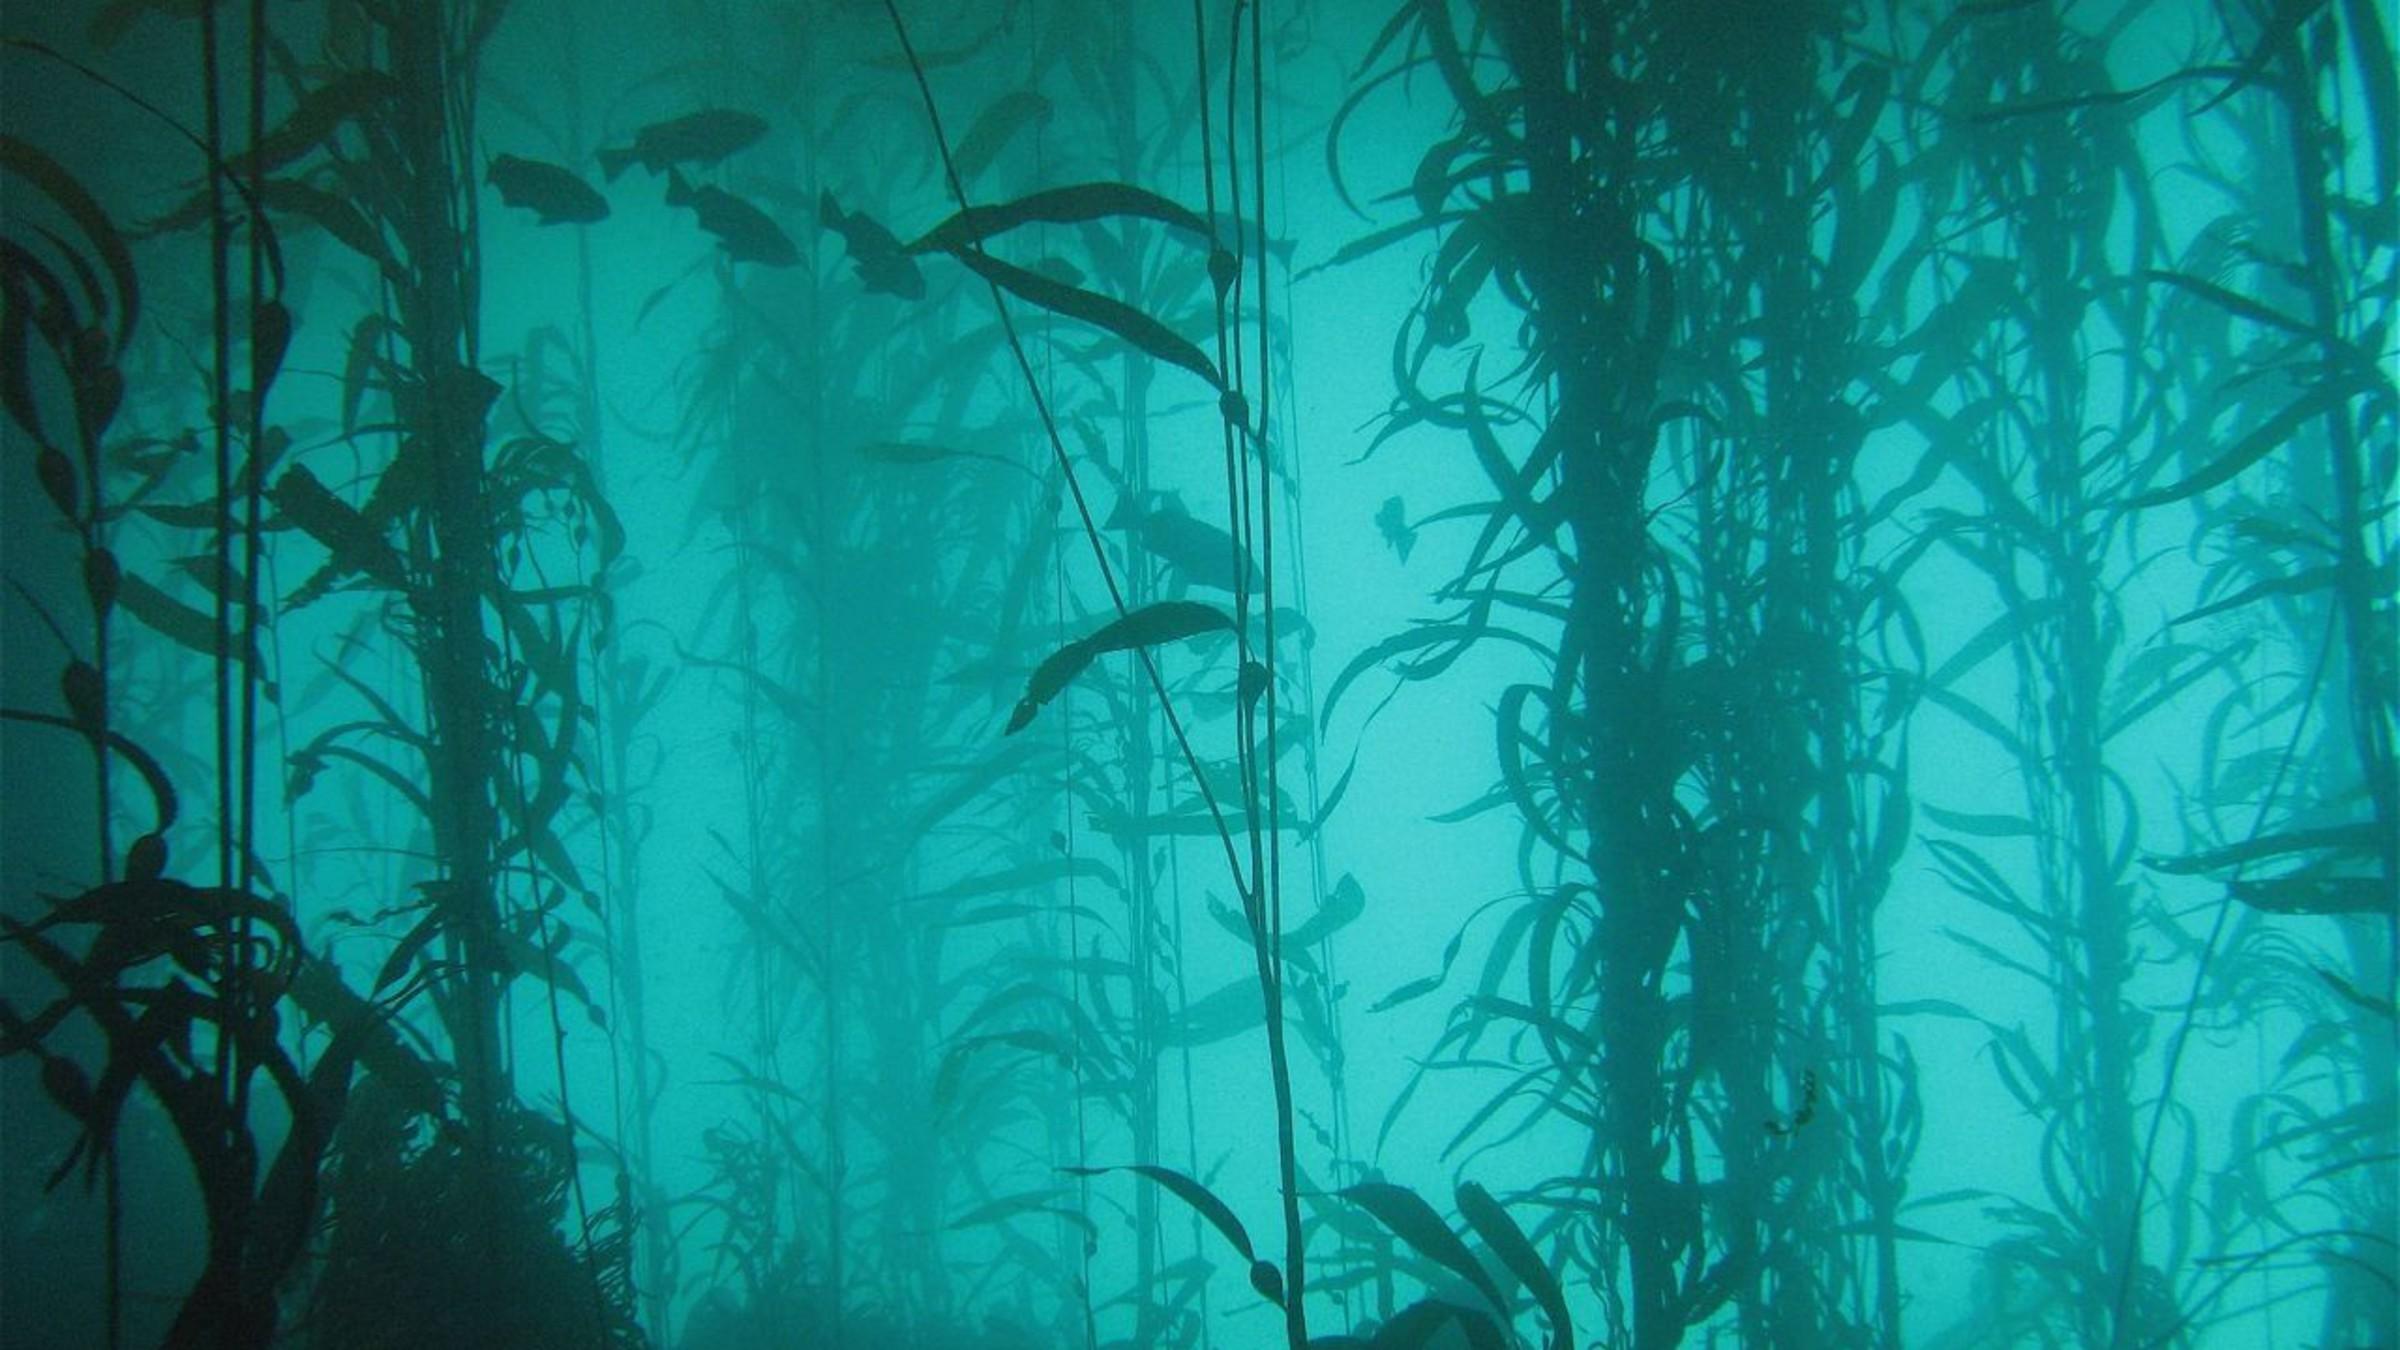 ocean-nature-fish-plants-lakes-algae-underwater-2400x1350-wallpaper.jpg